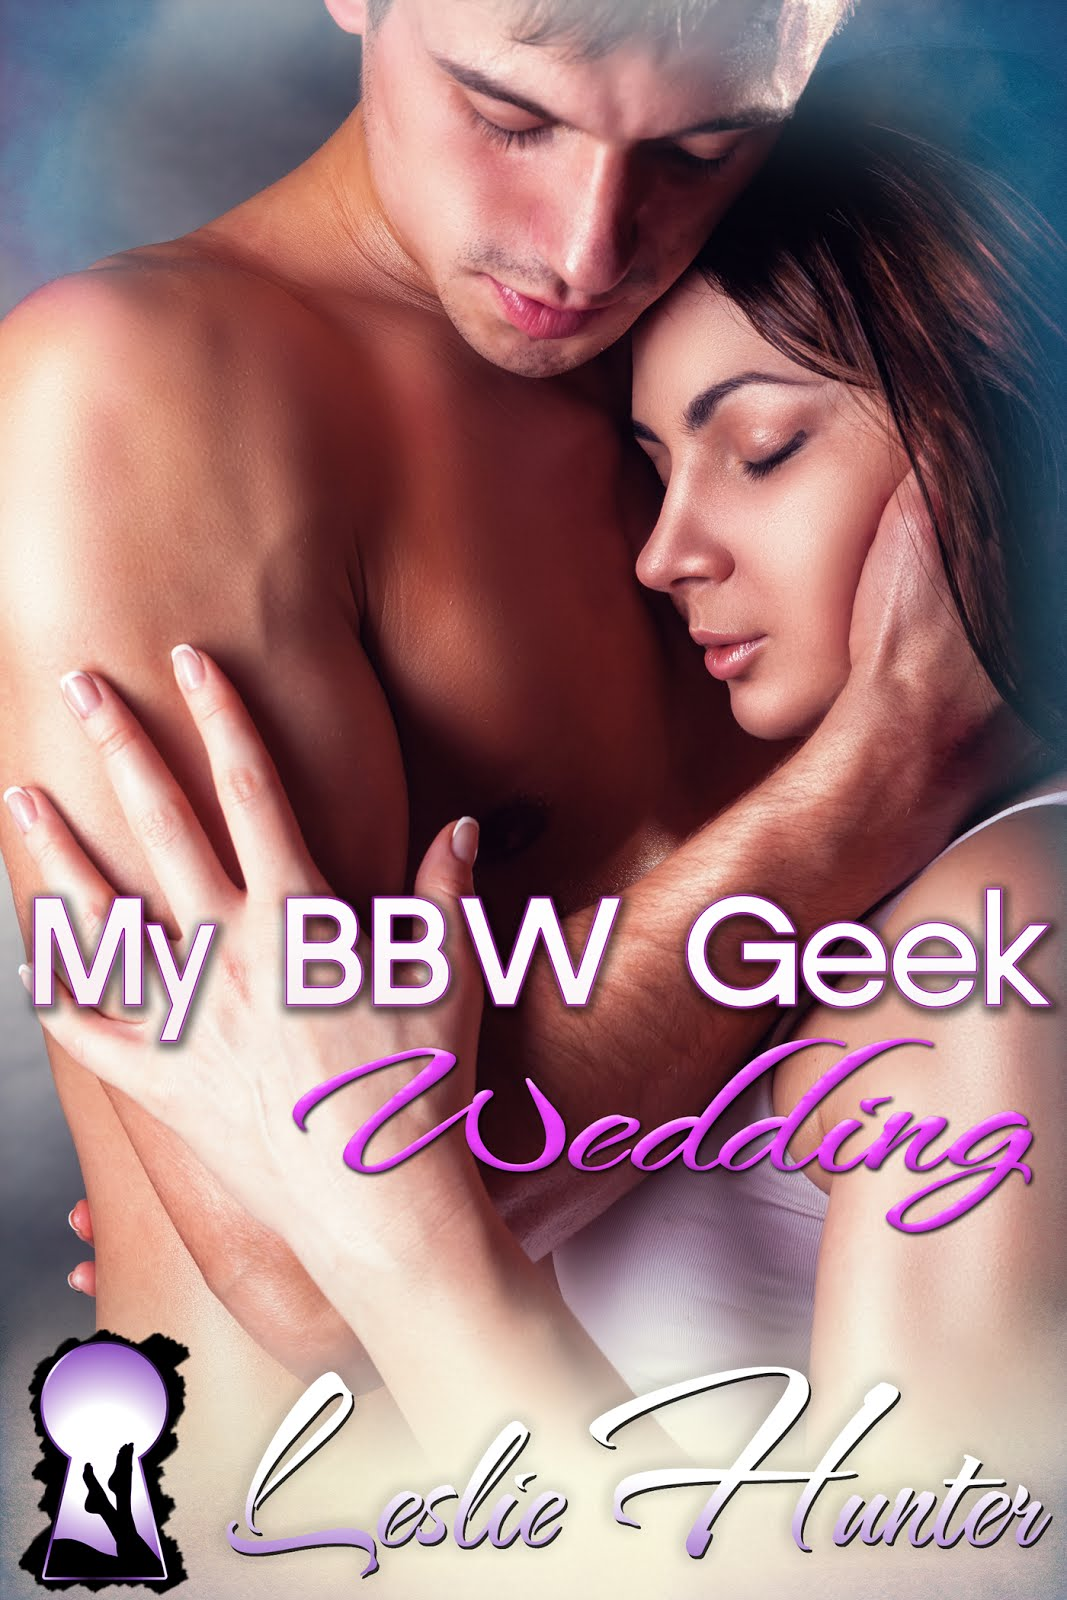 BBW Romance for 99 cents!